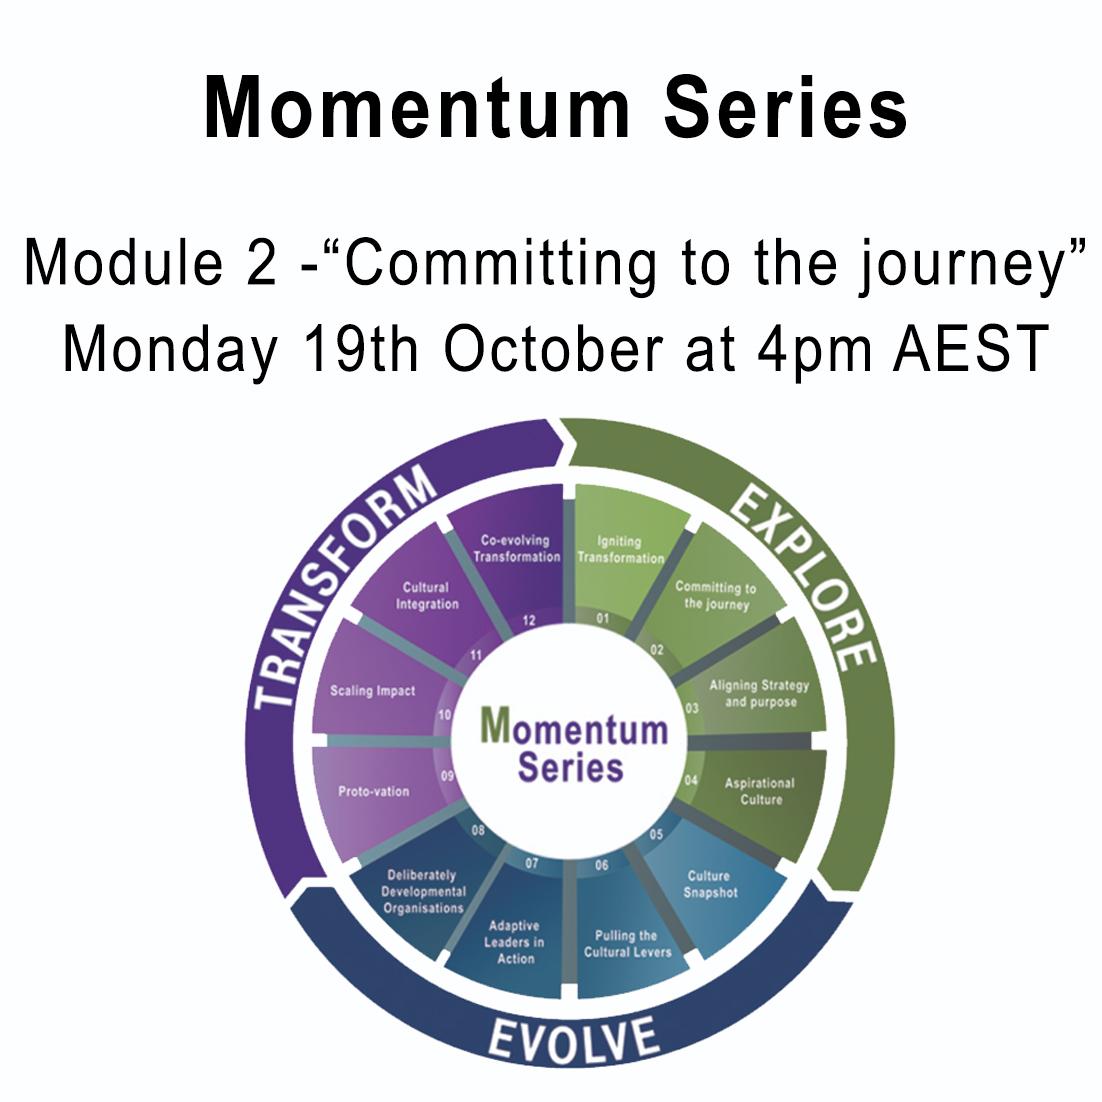 Fsa Events Momentum Series